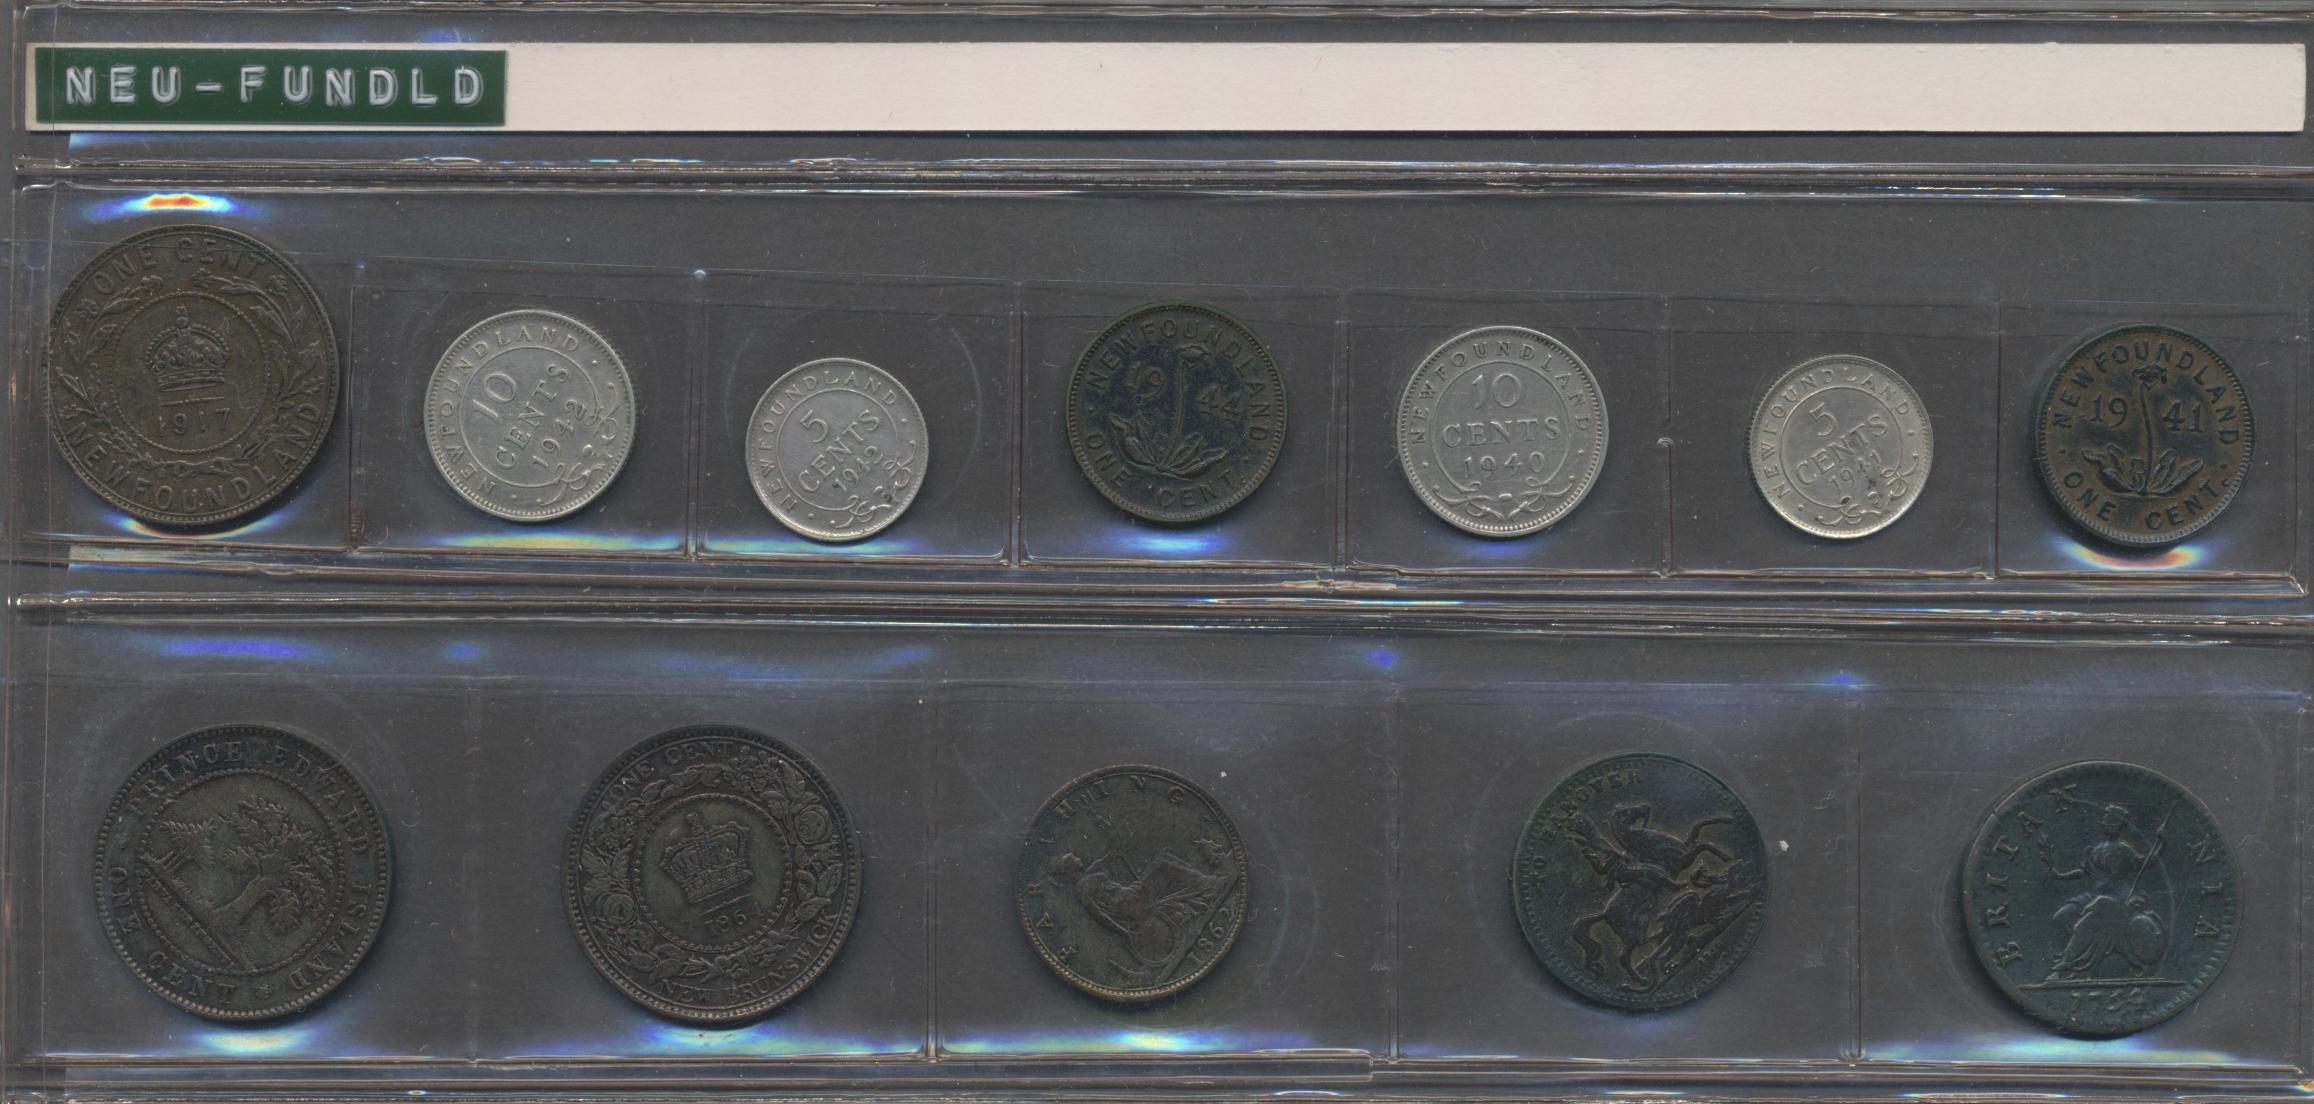 Lot 05068 - Kanada   Übersee  -  Auktionshaus Christoph Gärtner GmbH & Co. KG Sale #45 Banknotes Germany/Numismatics